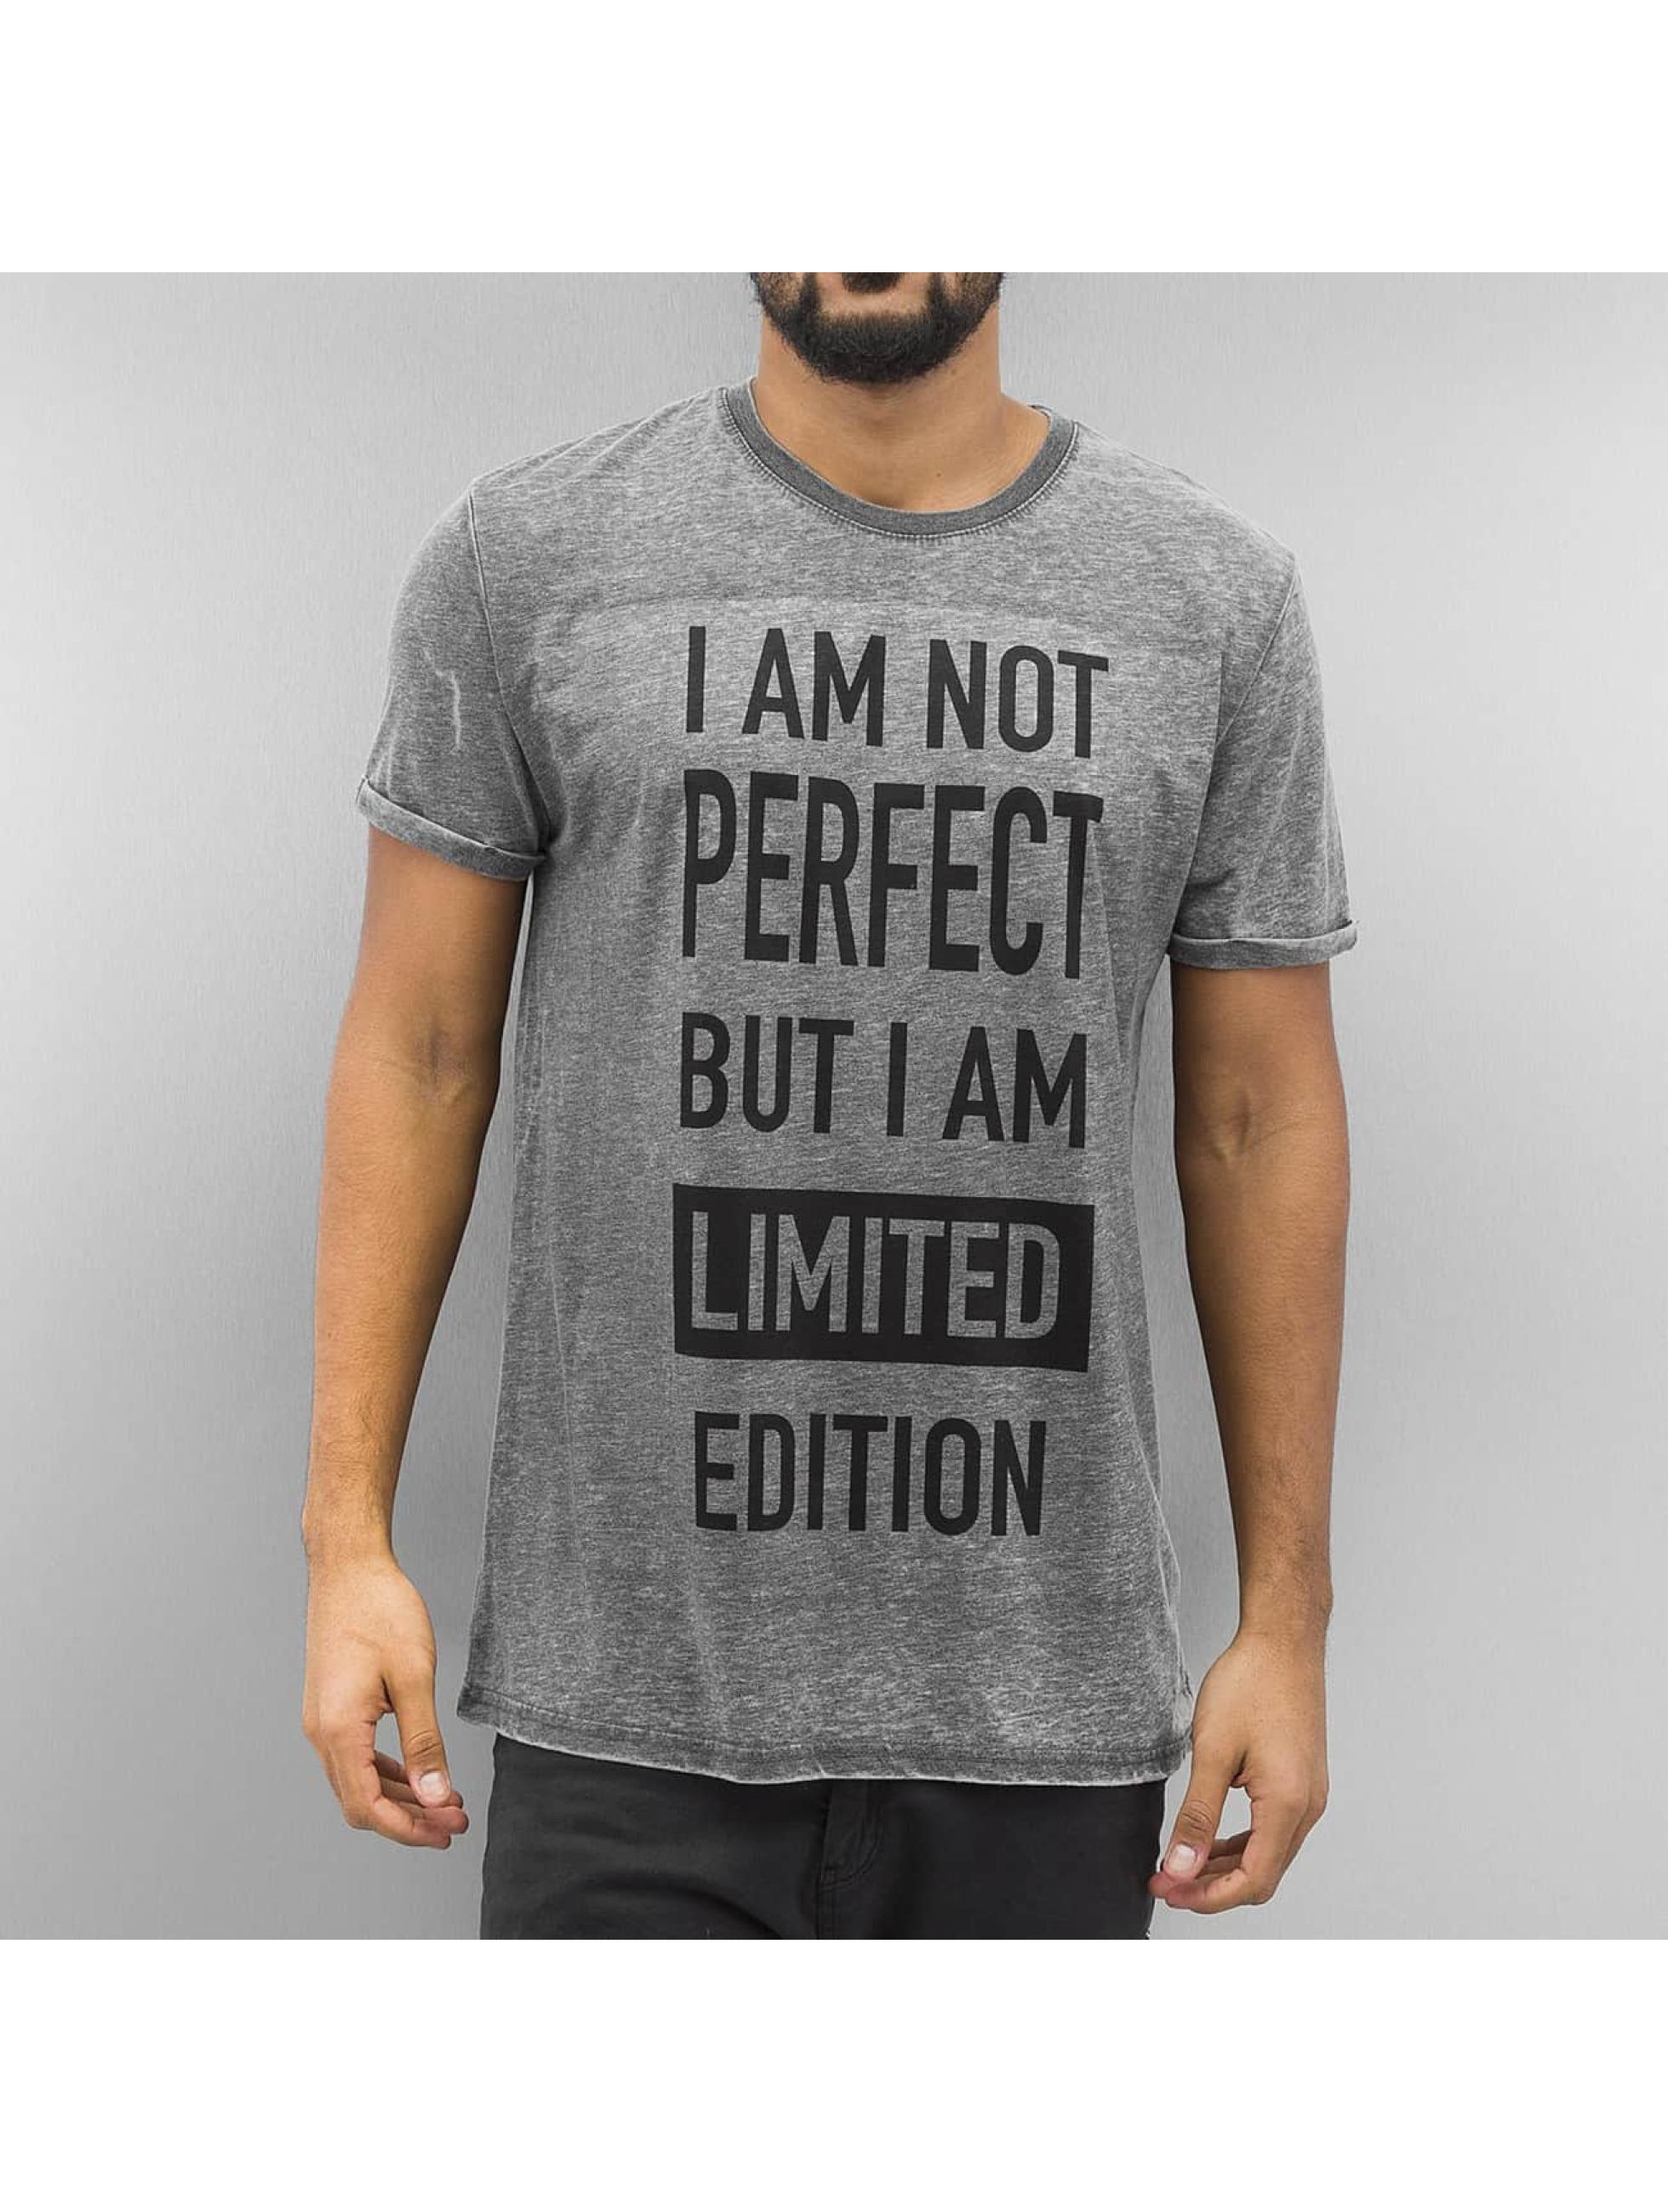 Monkey Business T-Shirt Limited Edition grau